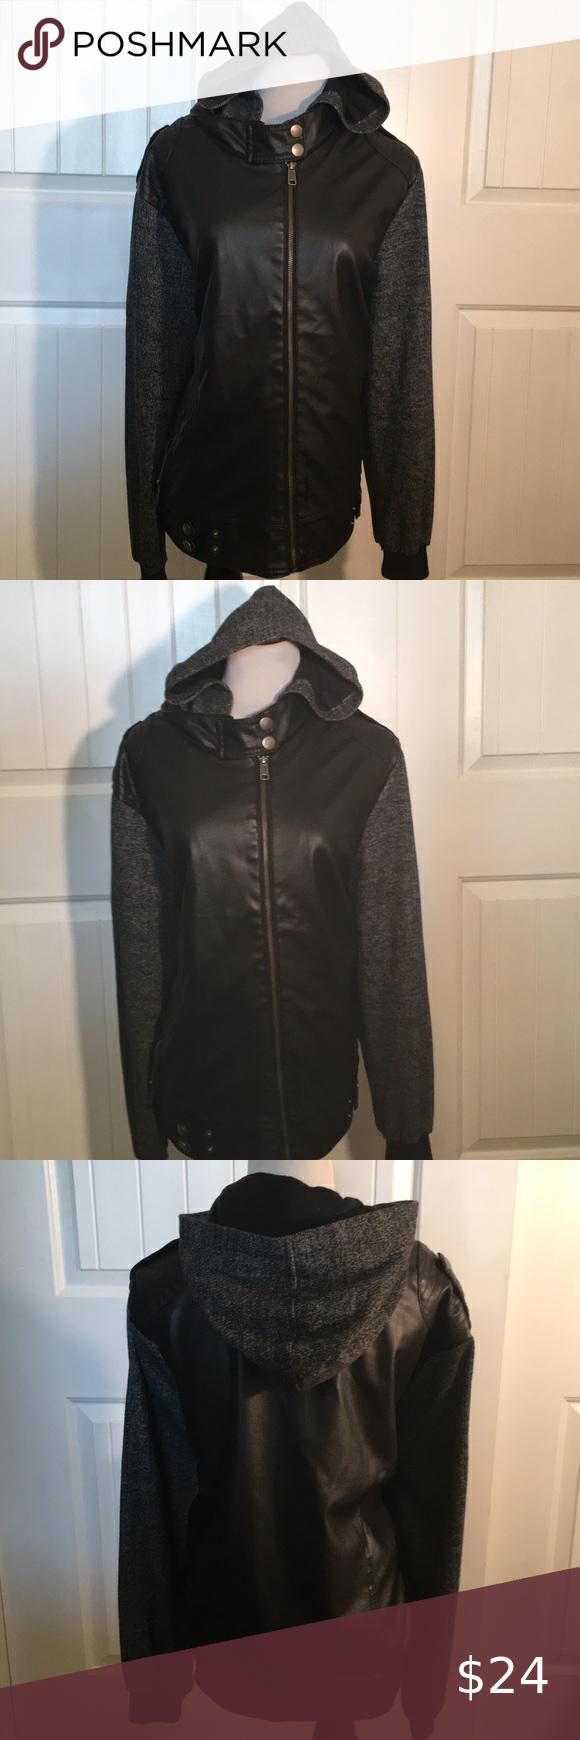 New Look Faux Leather Jacket Leather Jacket New Look Jackets Jackets [ 1740 x 580 Pixel ]